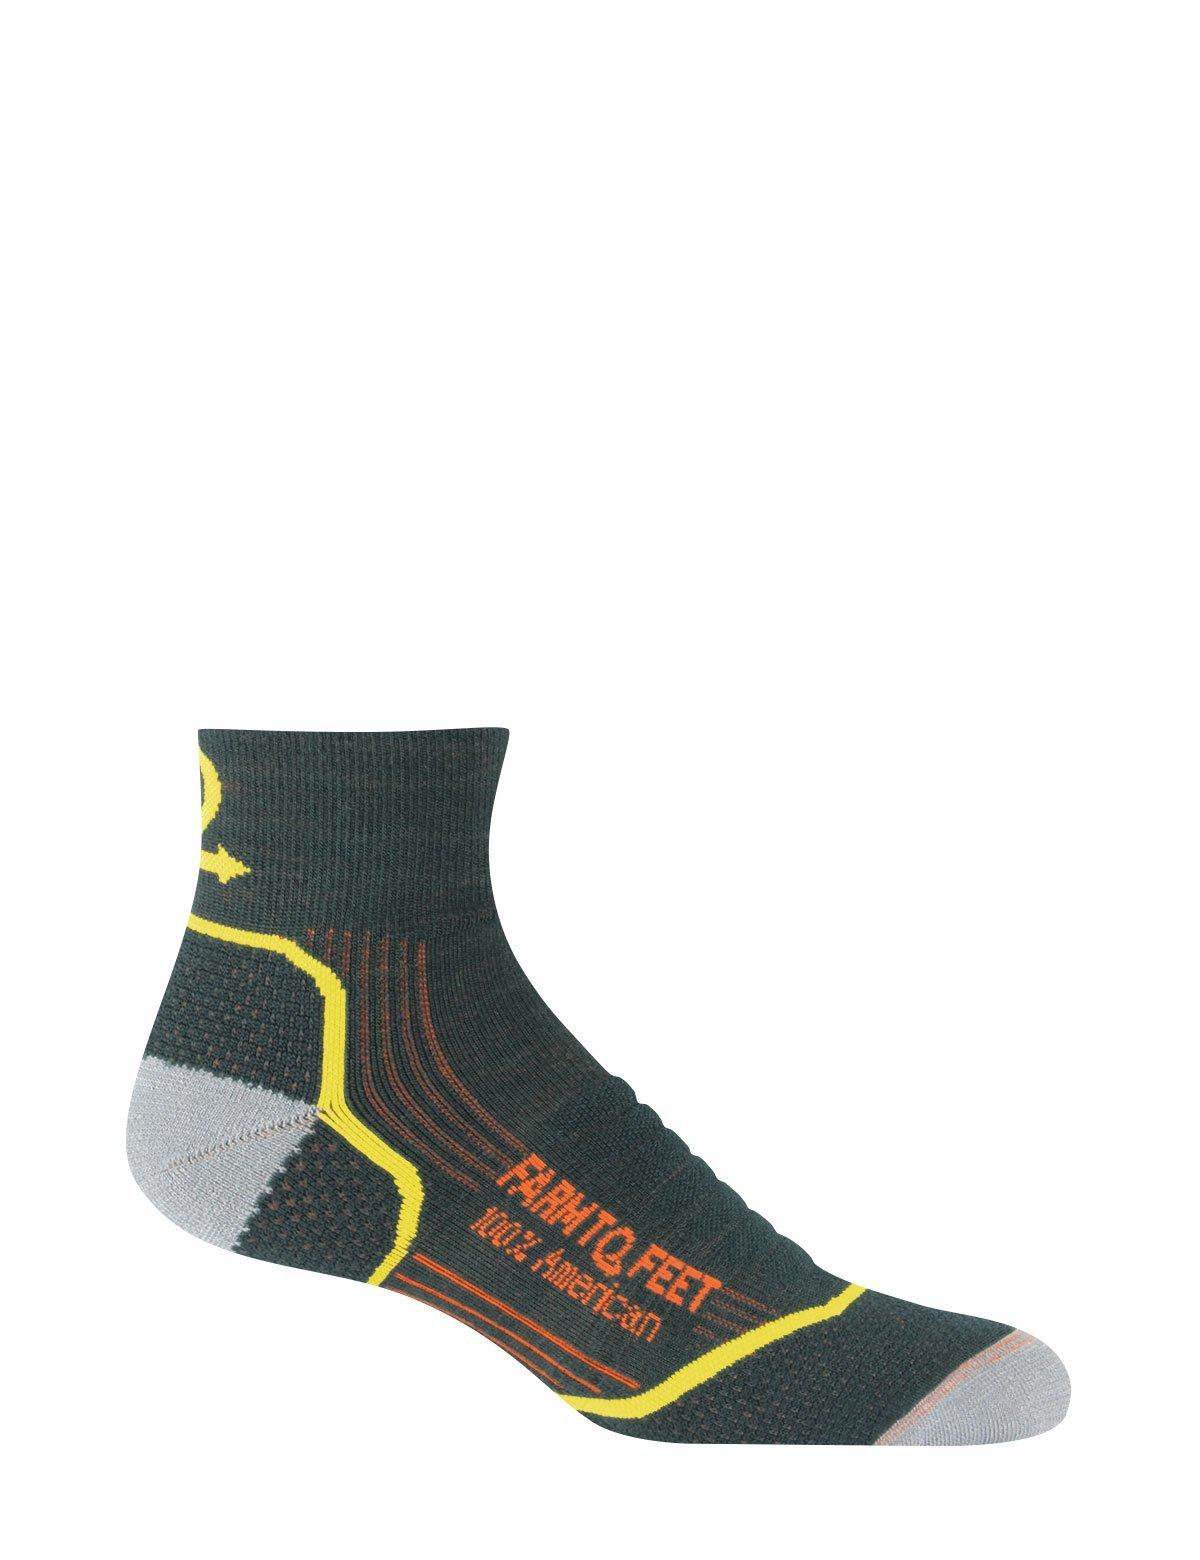 Farm To Feet Damascus Lightweight Technical 1/4 Crew Men's socks